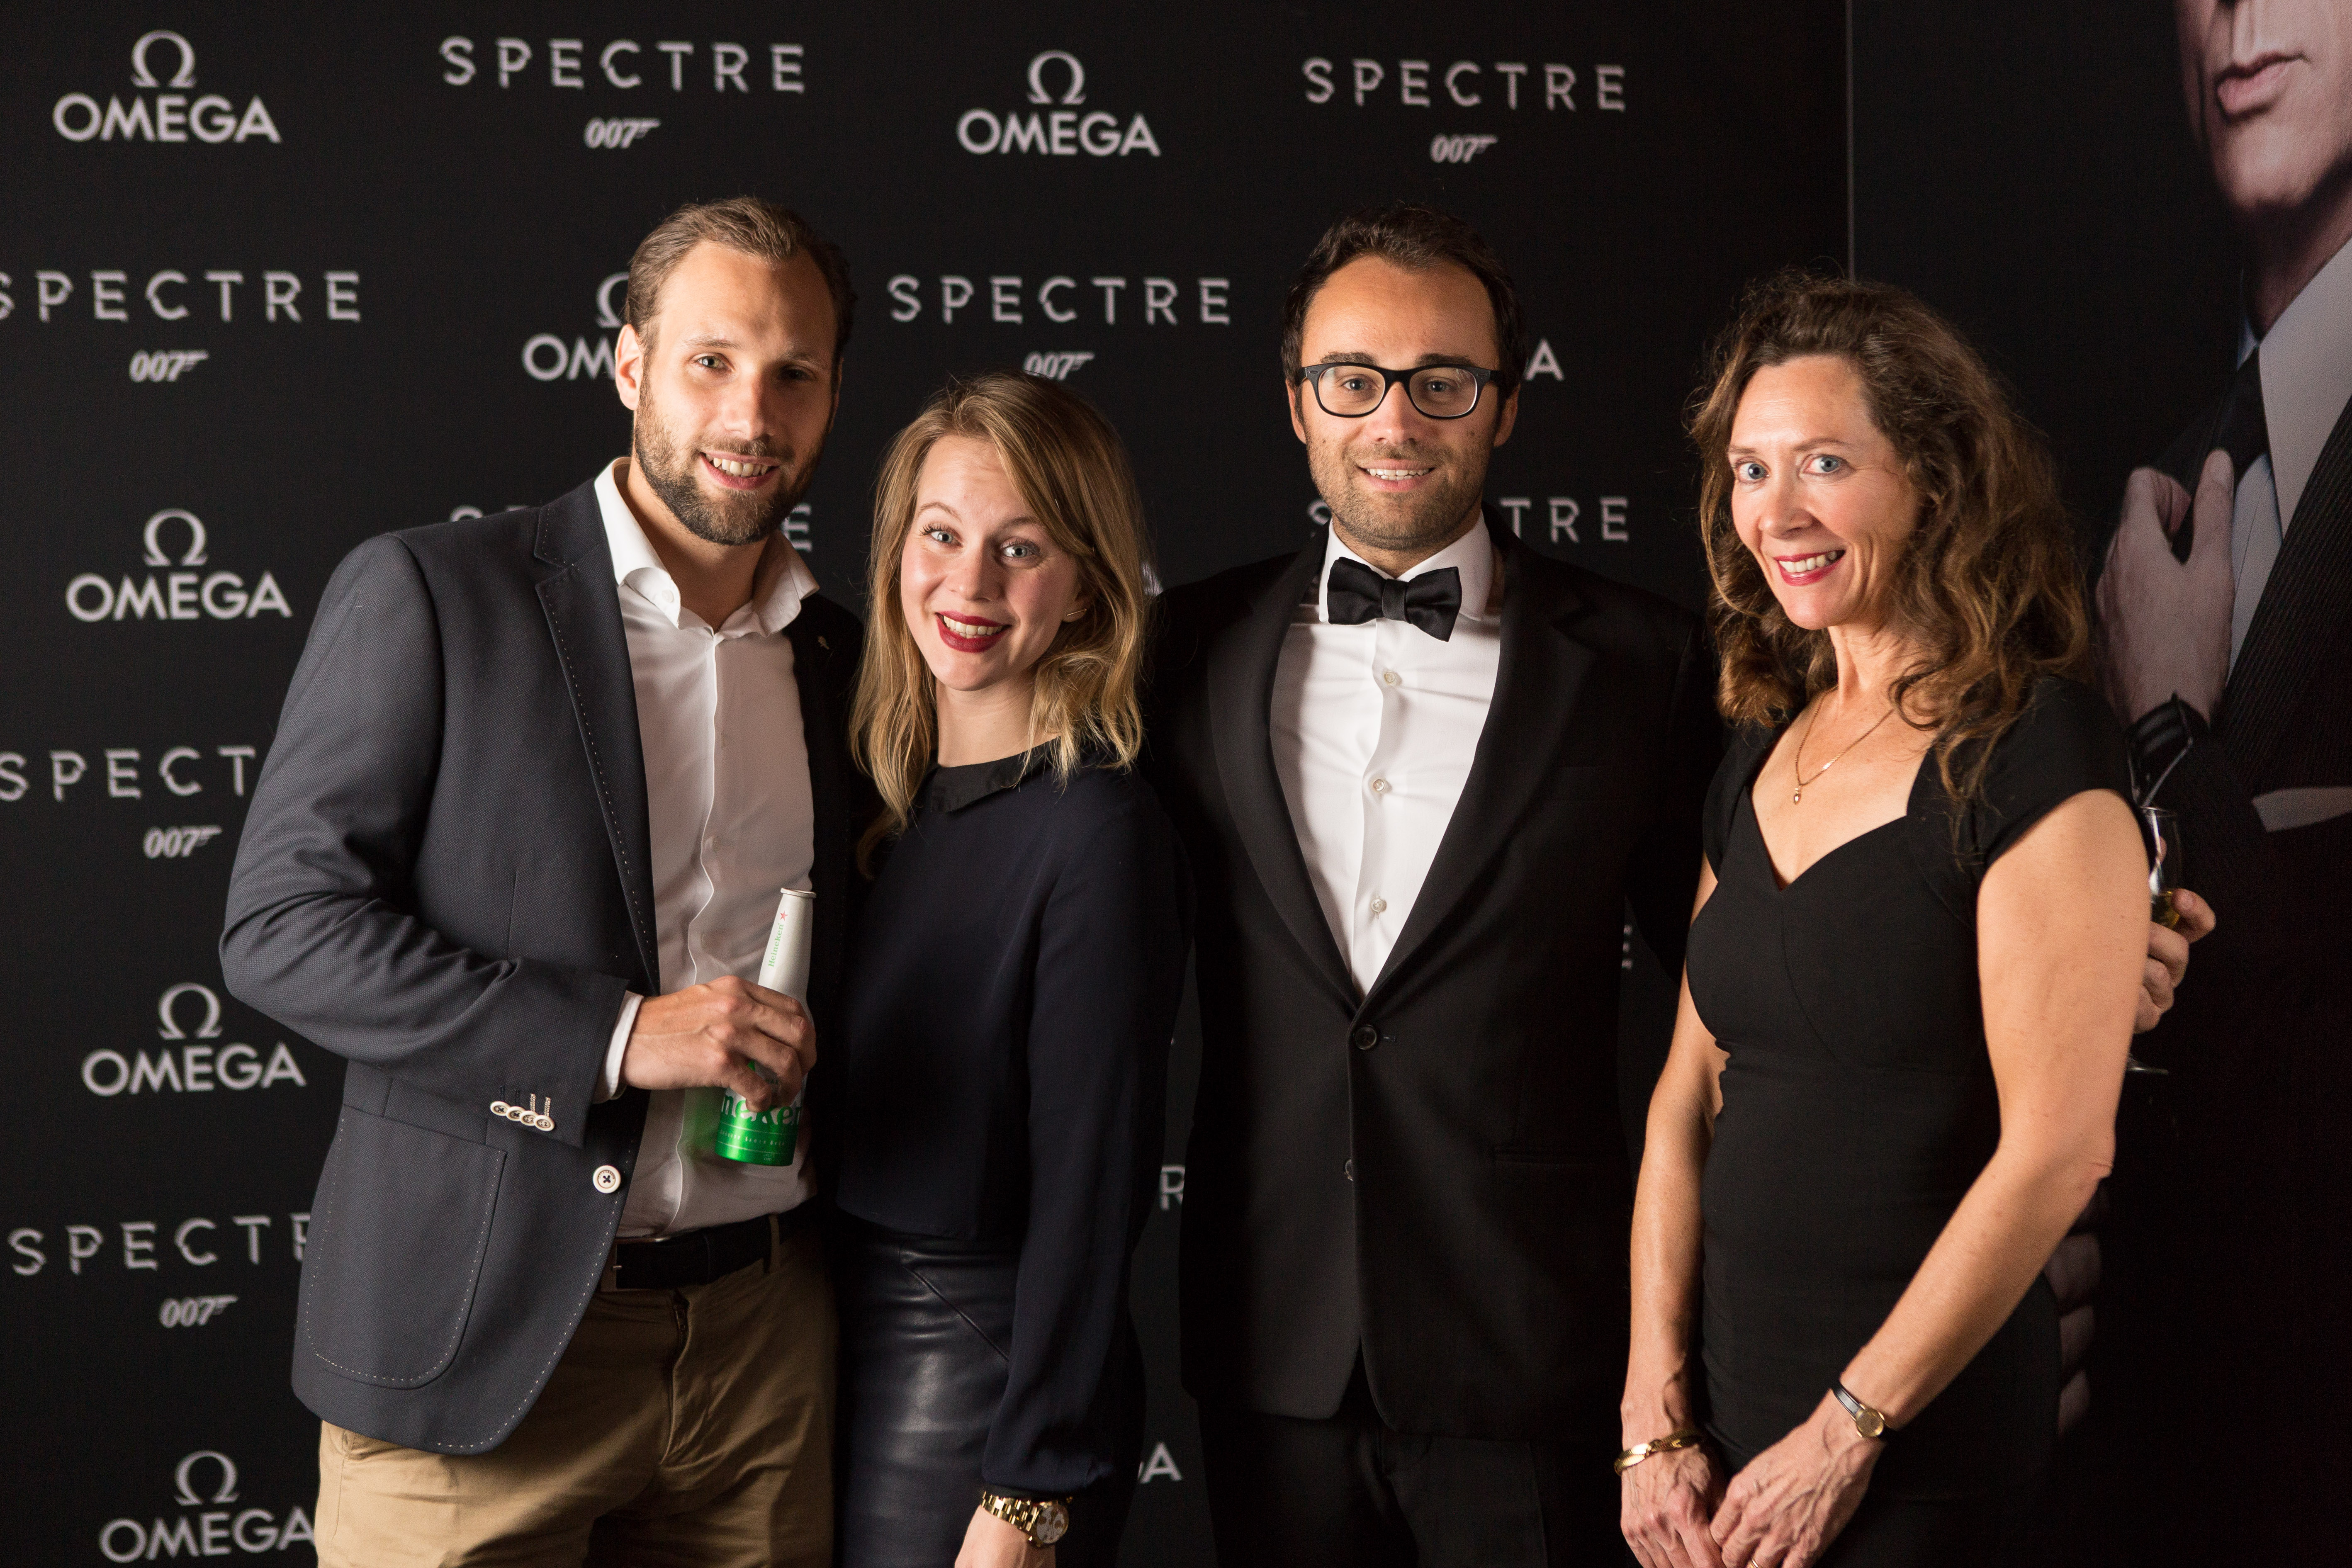 spectre-omega wall-67